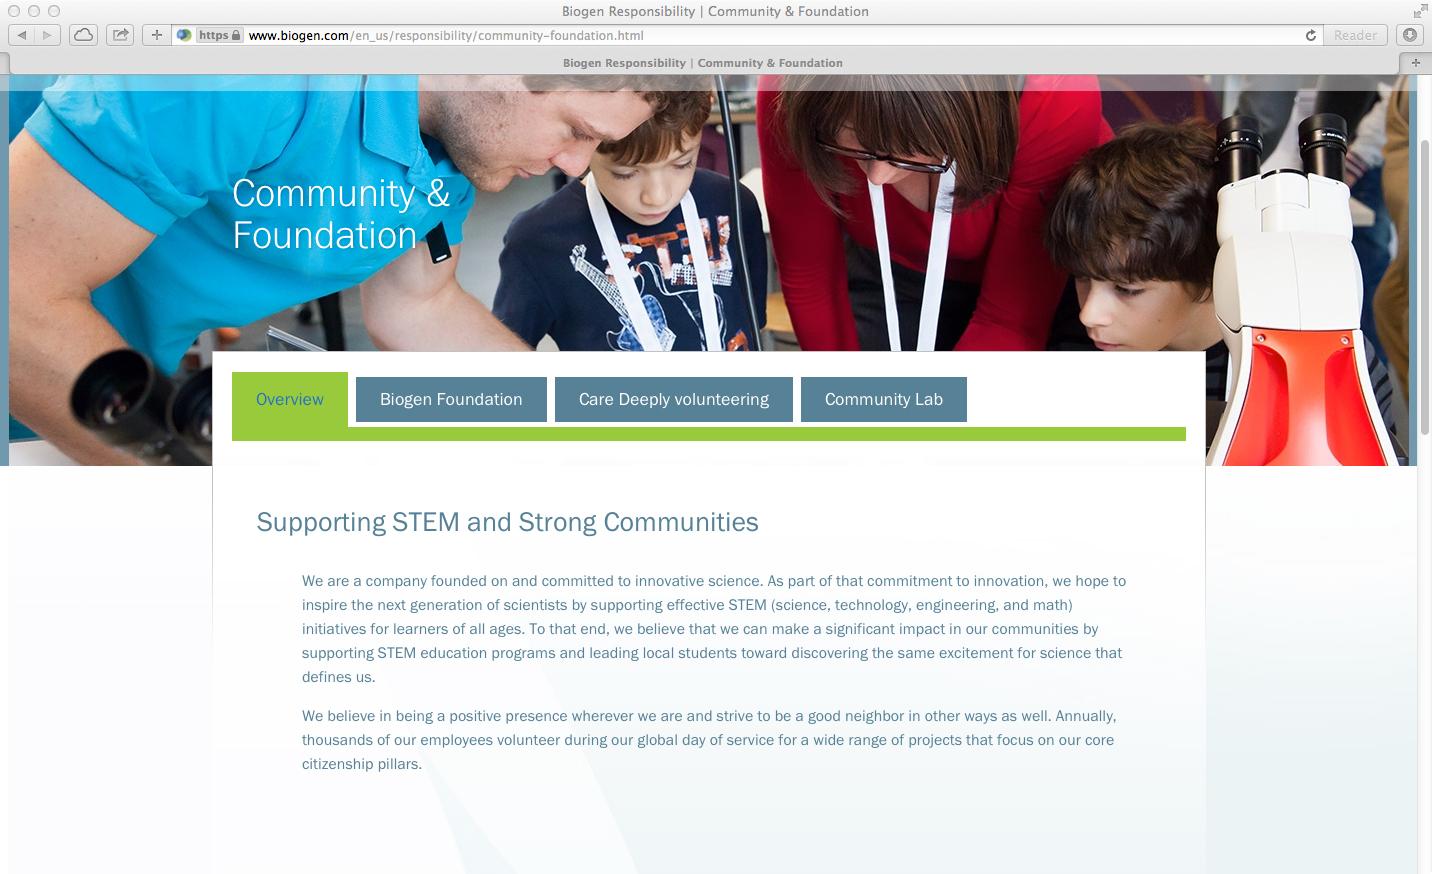 Biogen-Community-&-Foundation.jpg